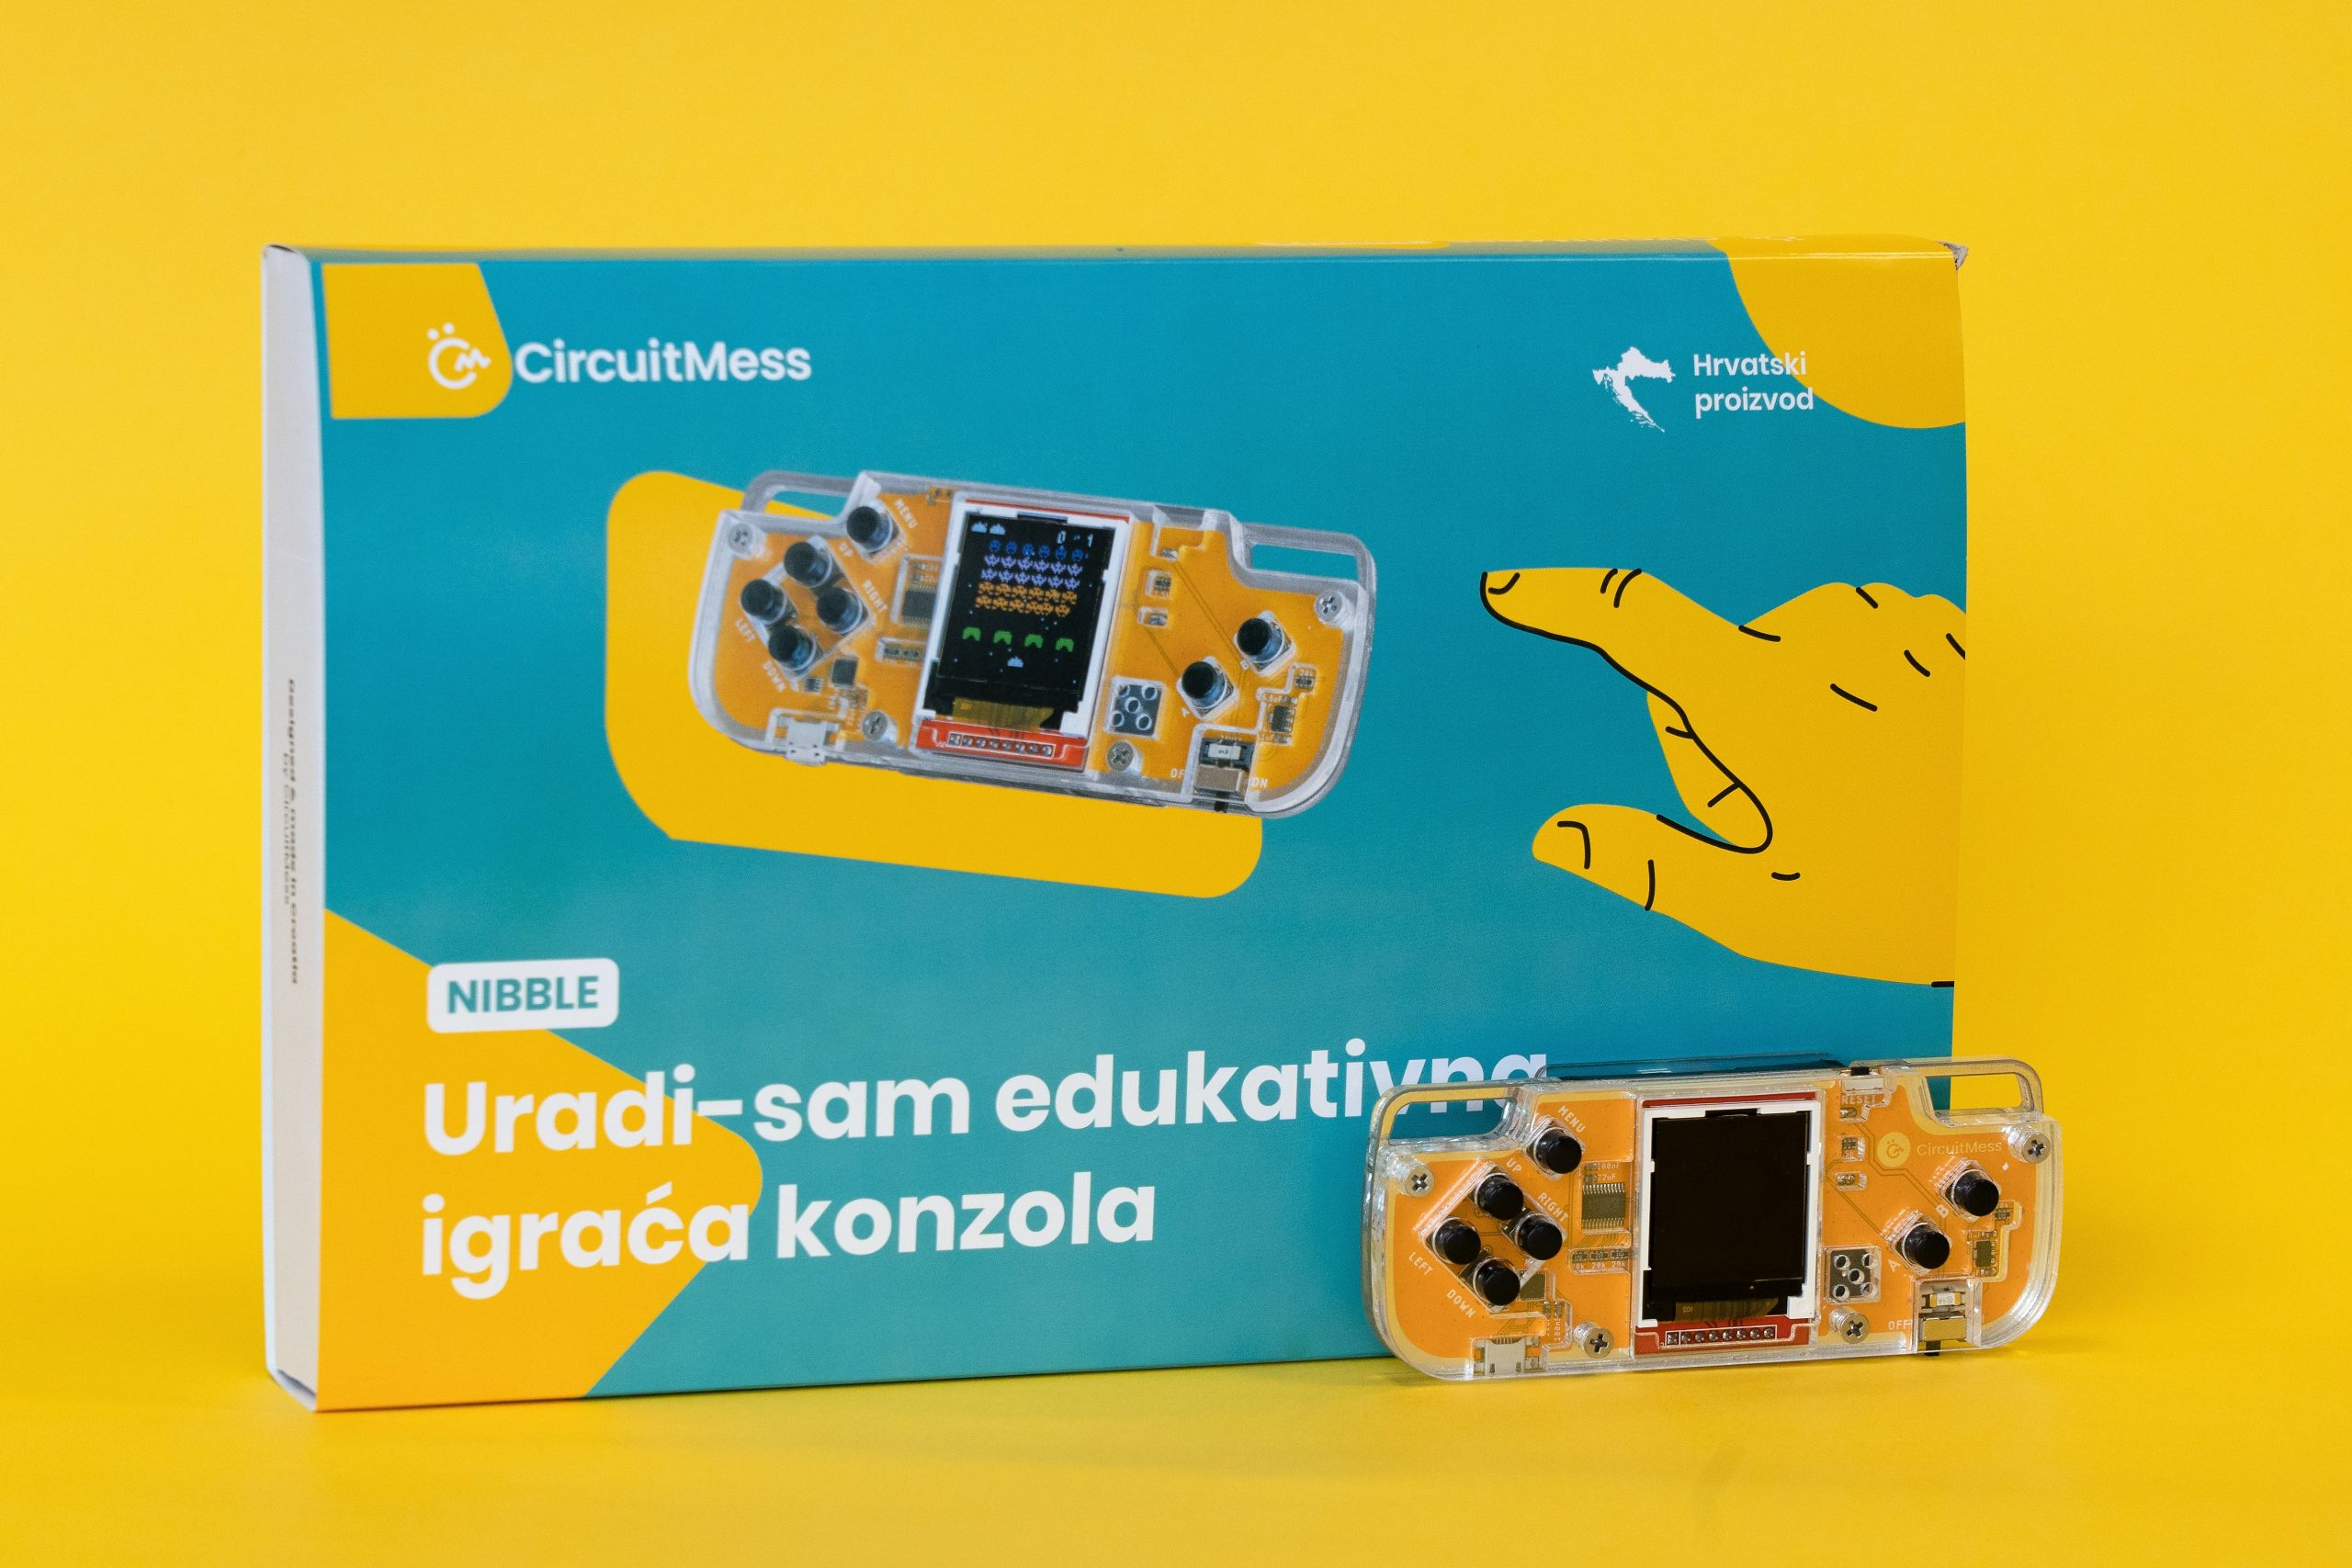 FOTO/CircuitMess